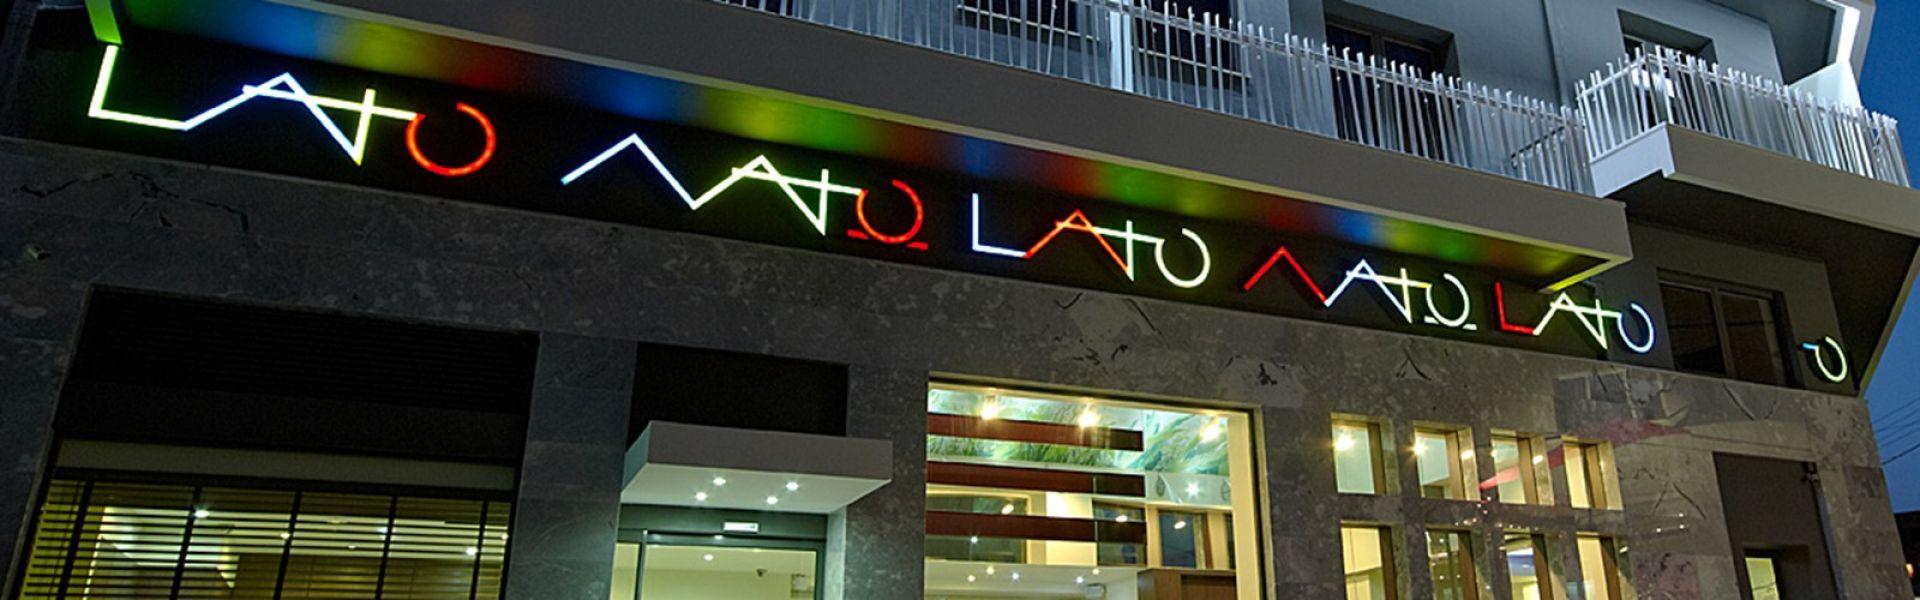 Lato Boutique Exterior